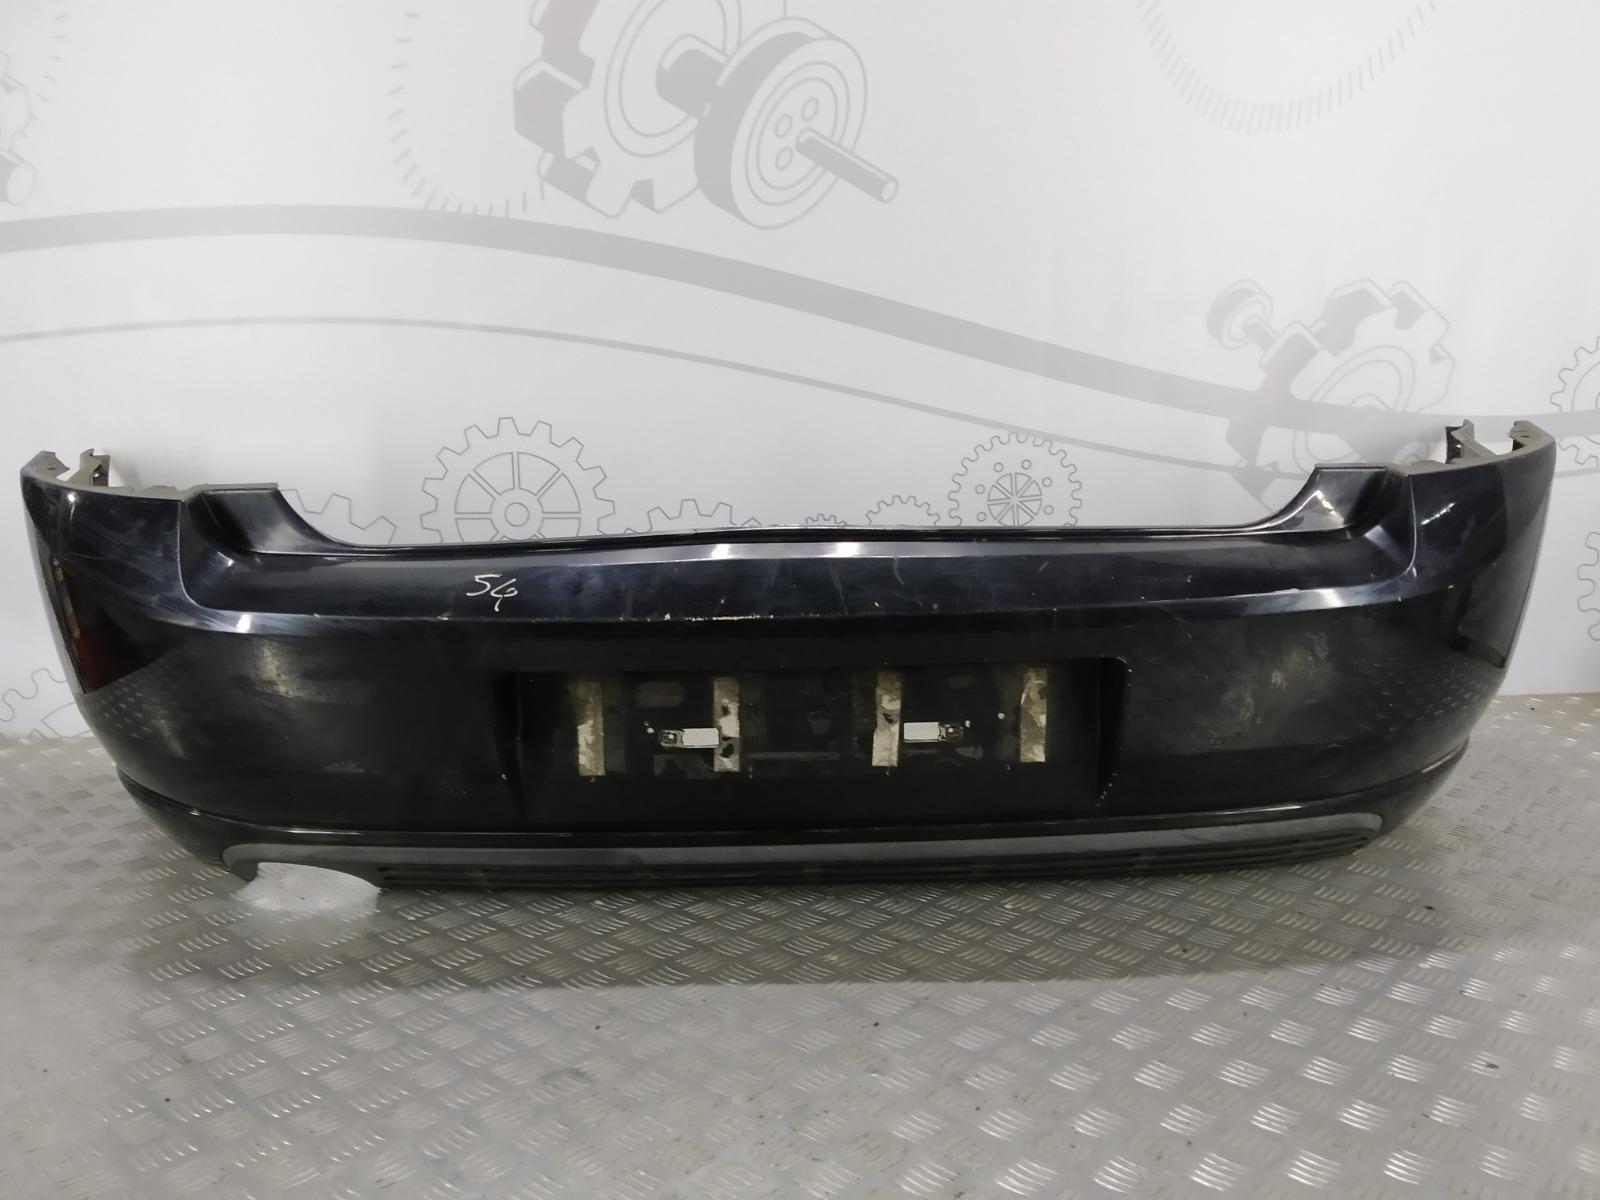 Бампер задний Opel Vectra C 1.9 CDTI 2005 (б/у)